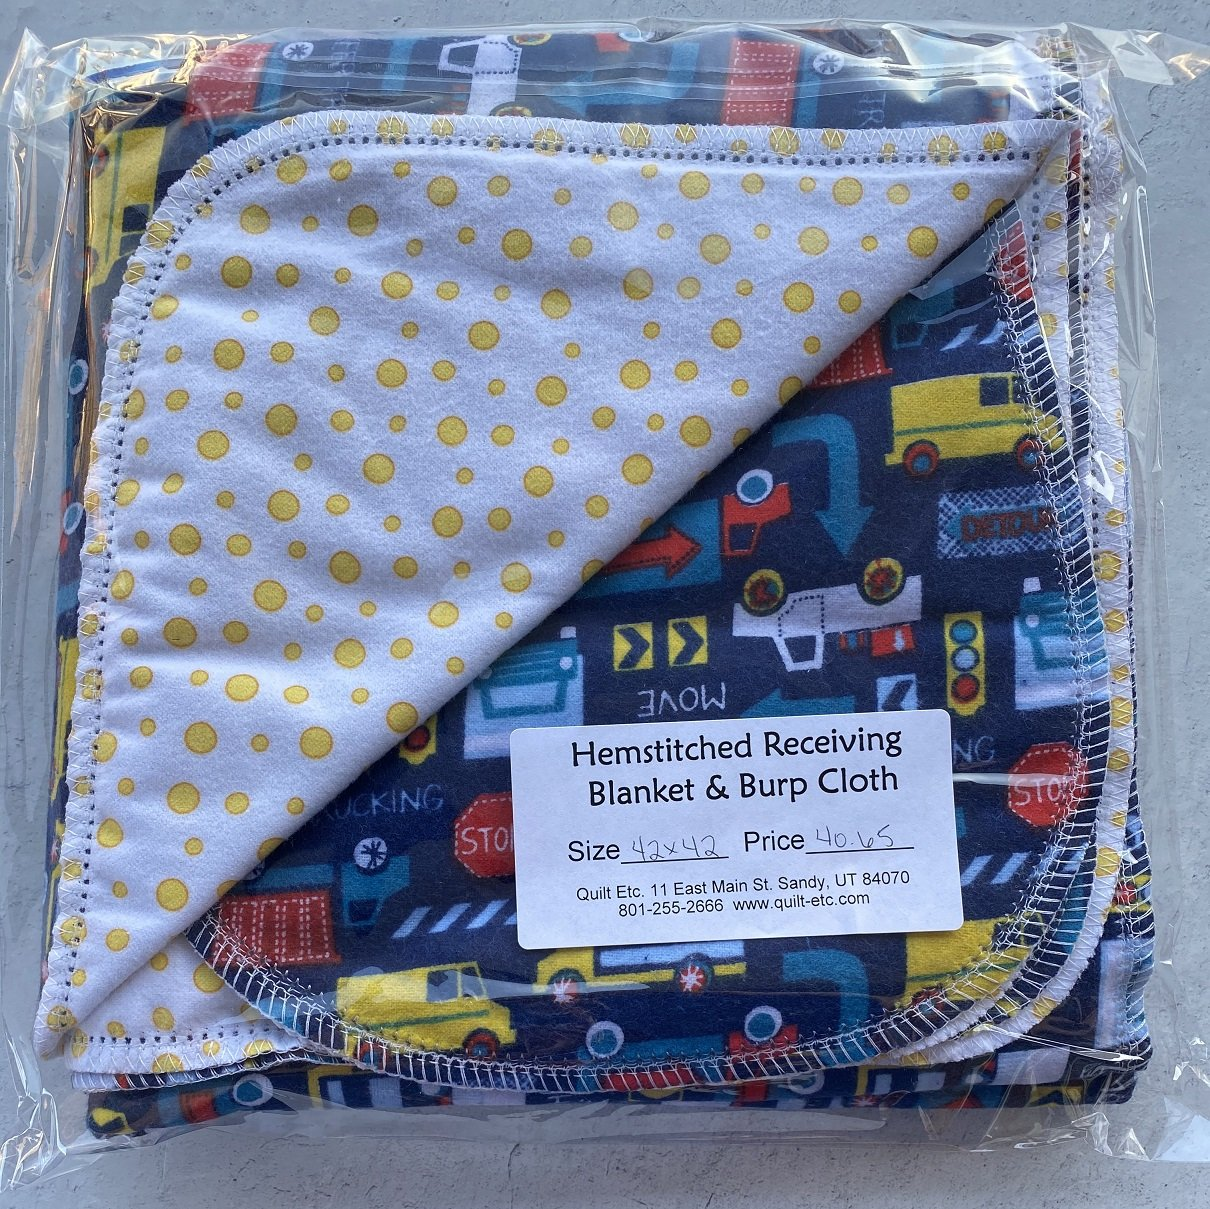 Hemstitched Receiving Blanket & Burp Cloth 20